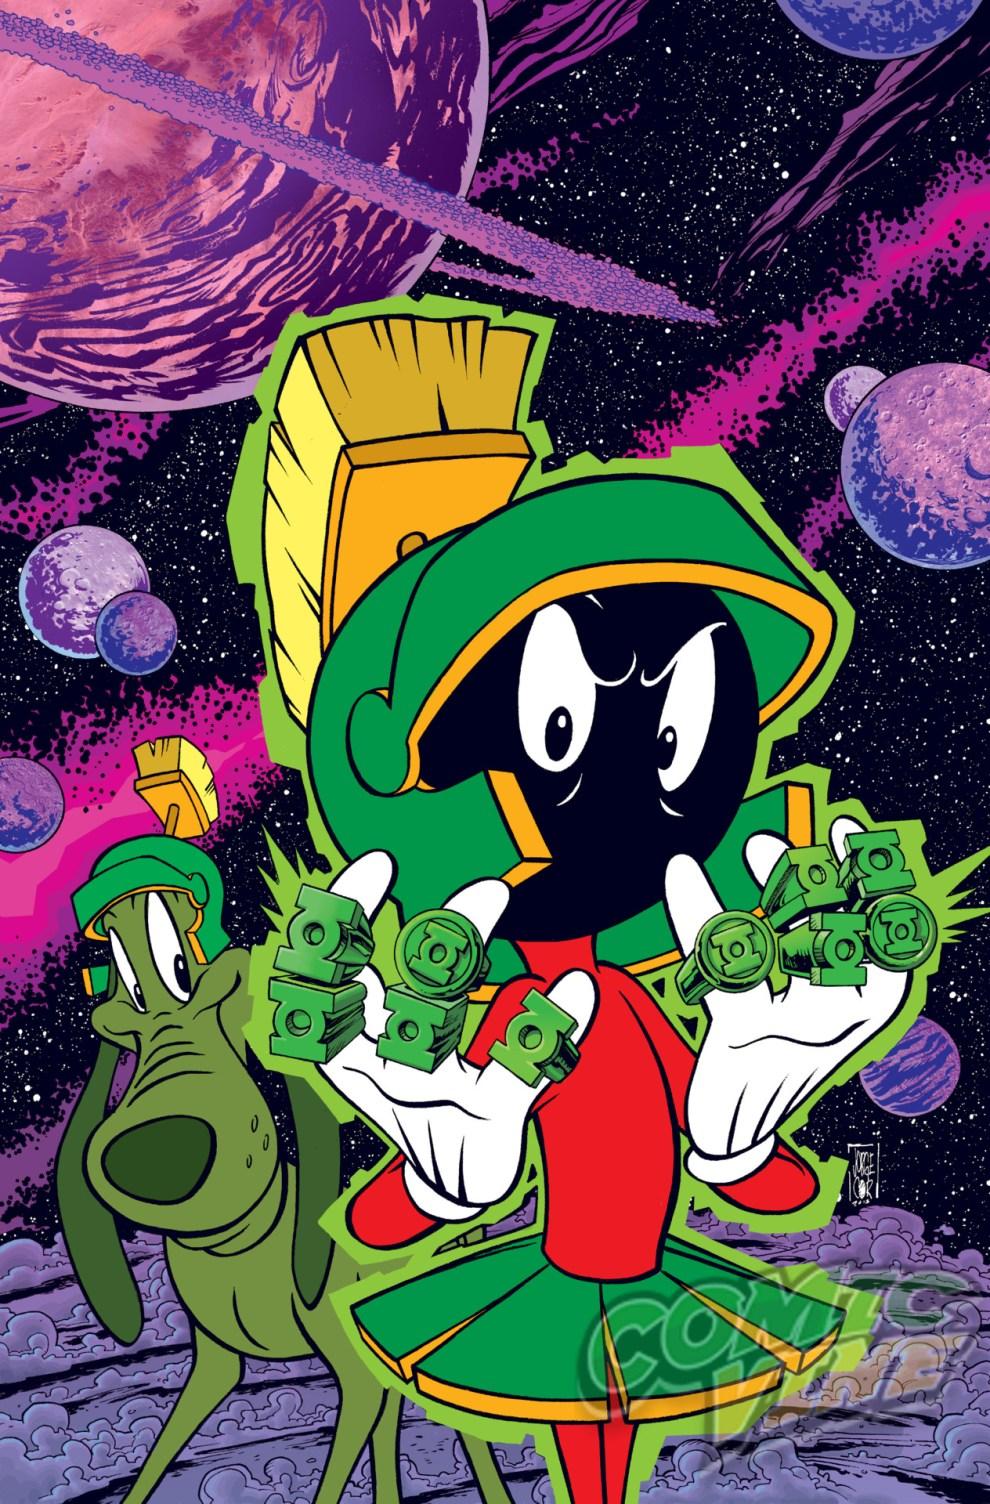 Green Lantern #46 by Jorge Corona and Warner Bros. Animation